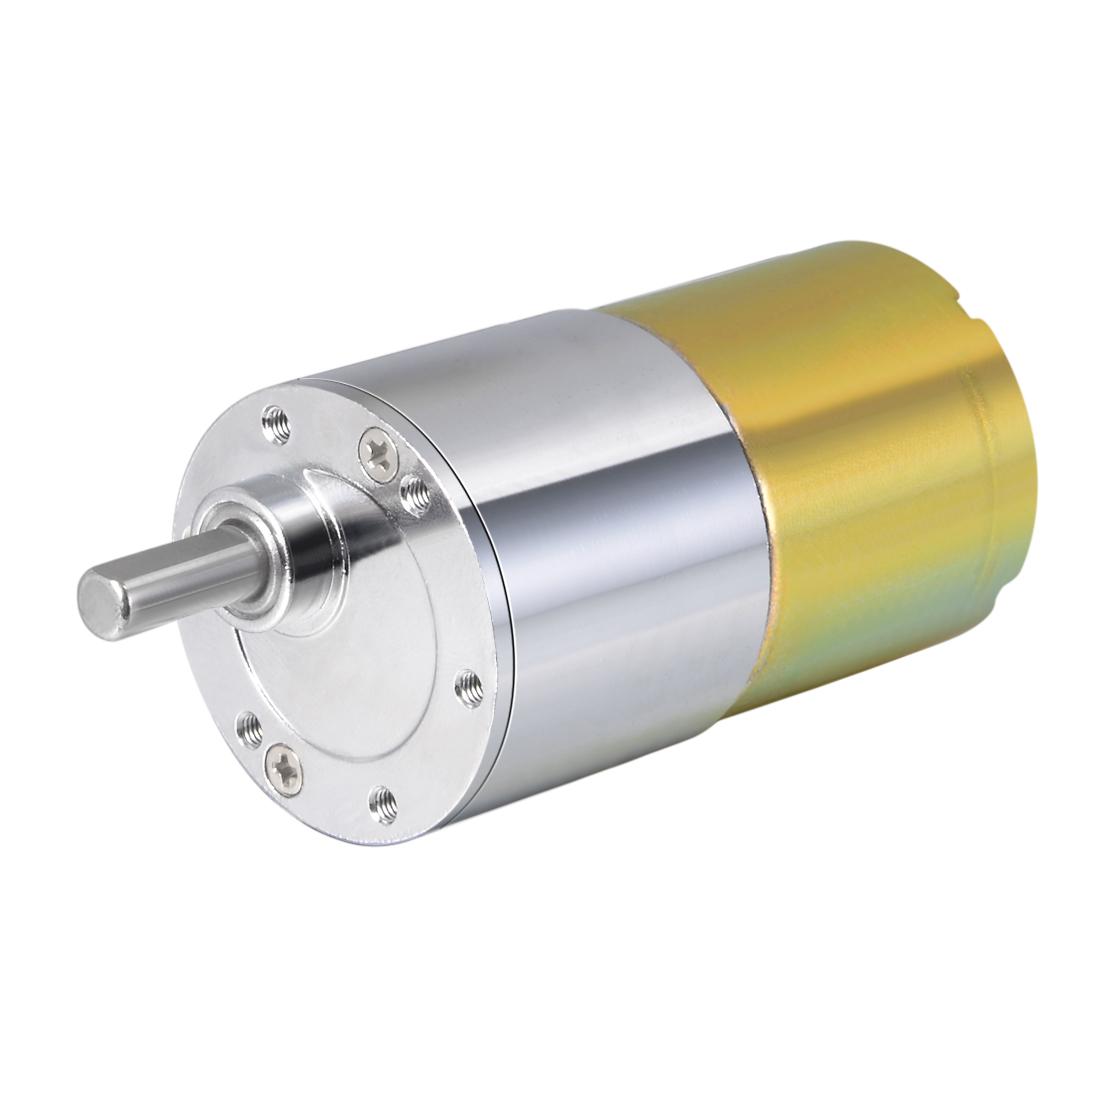 12V DC 5 RPM Gear Motor High Torque Reduction Gearbox Eccentric Output Shaft